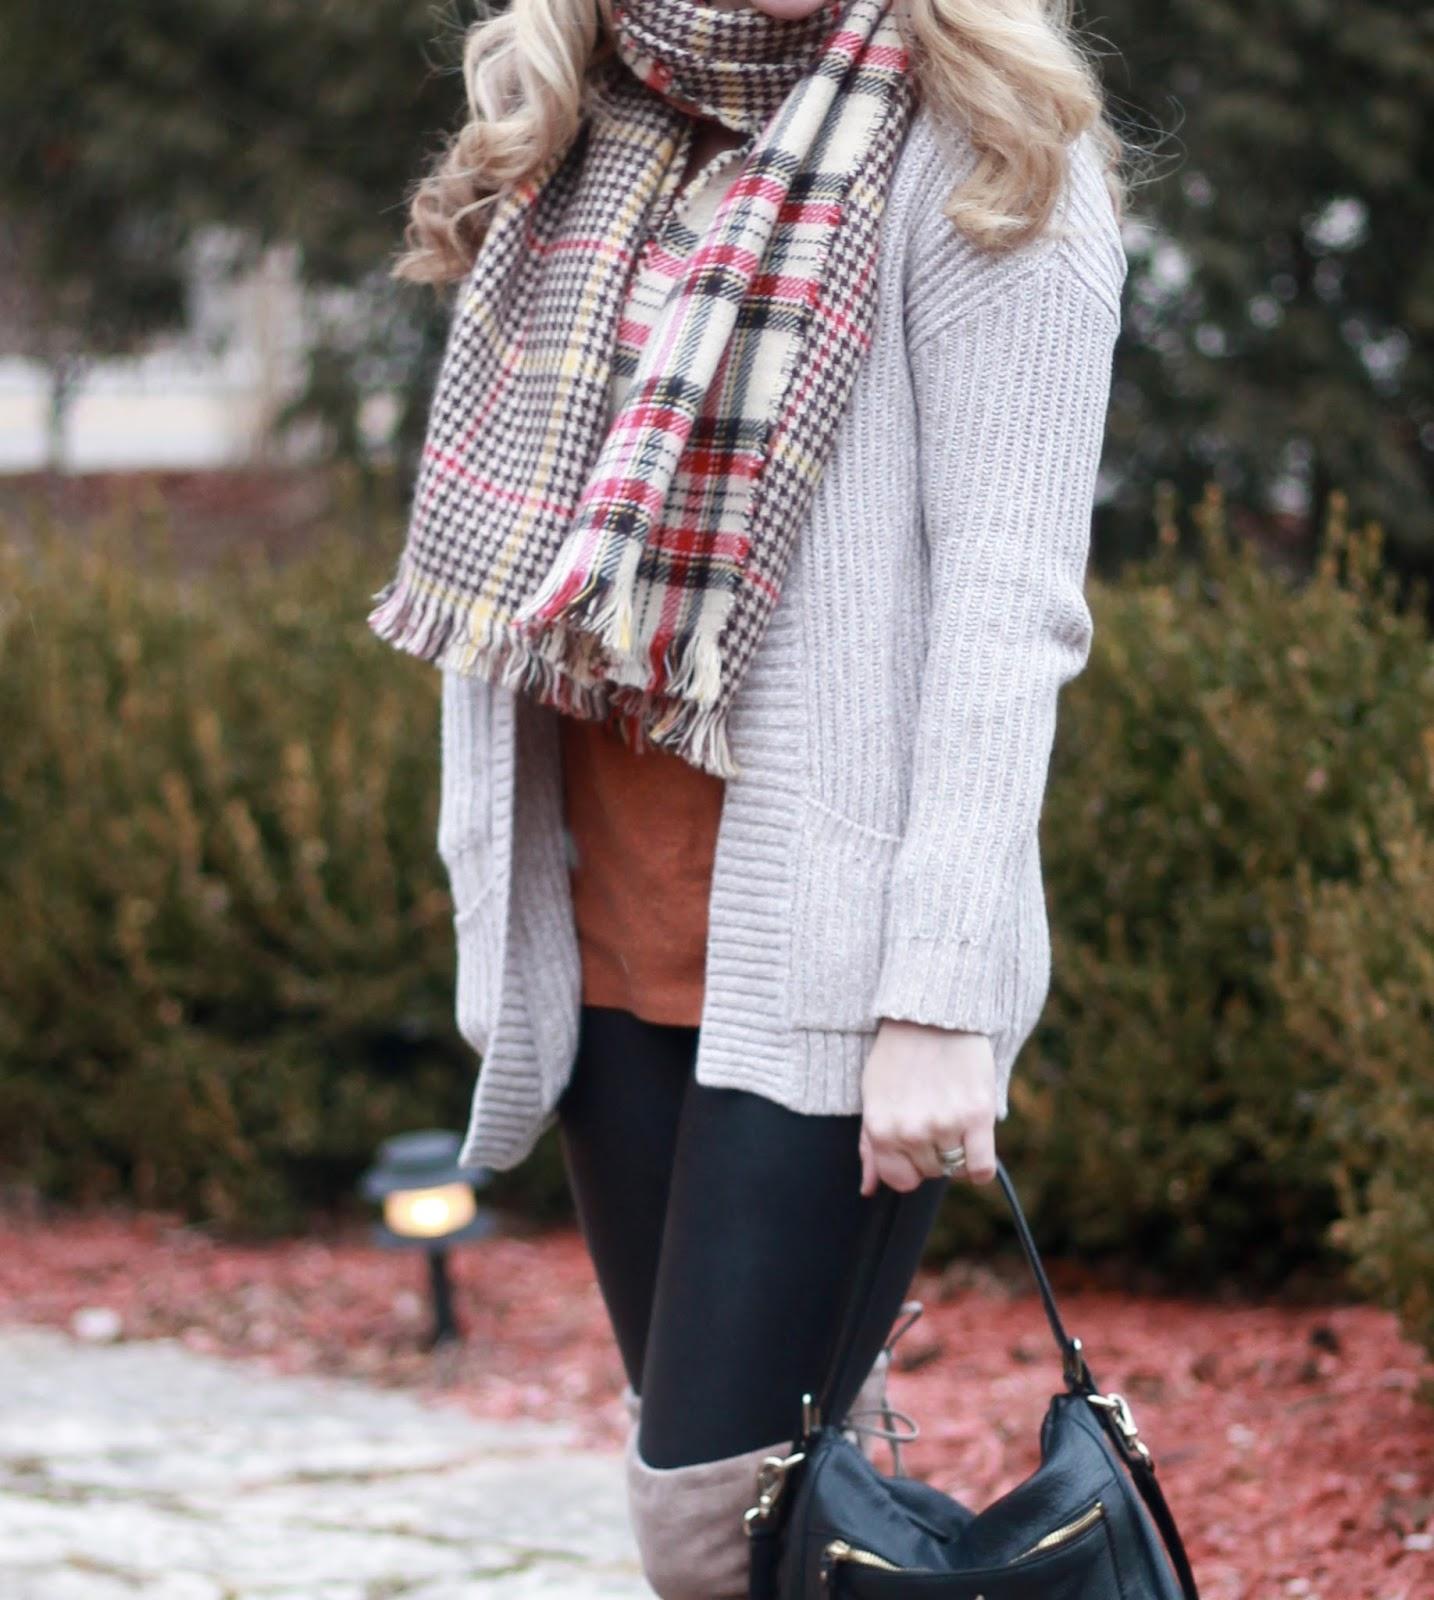 reversible plaid scarf, Spanx leather leggings, orange top, oatmeal knit cardigan, Kate Spade crossbody bag,